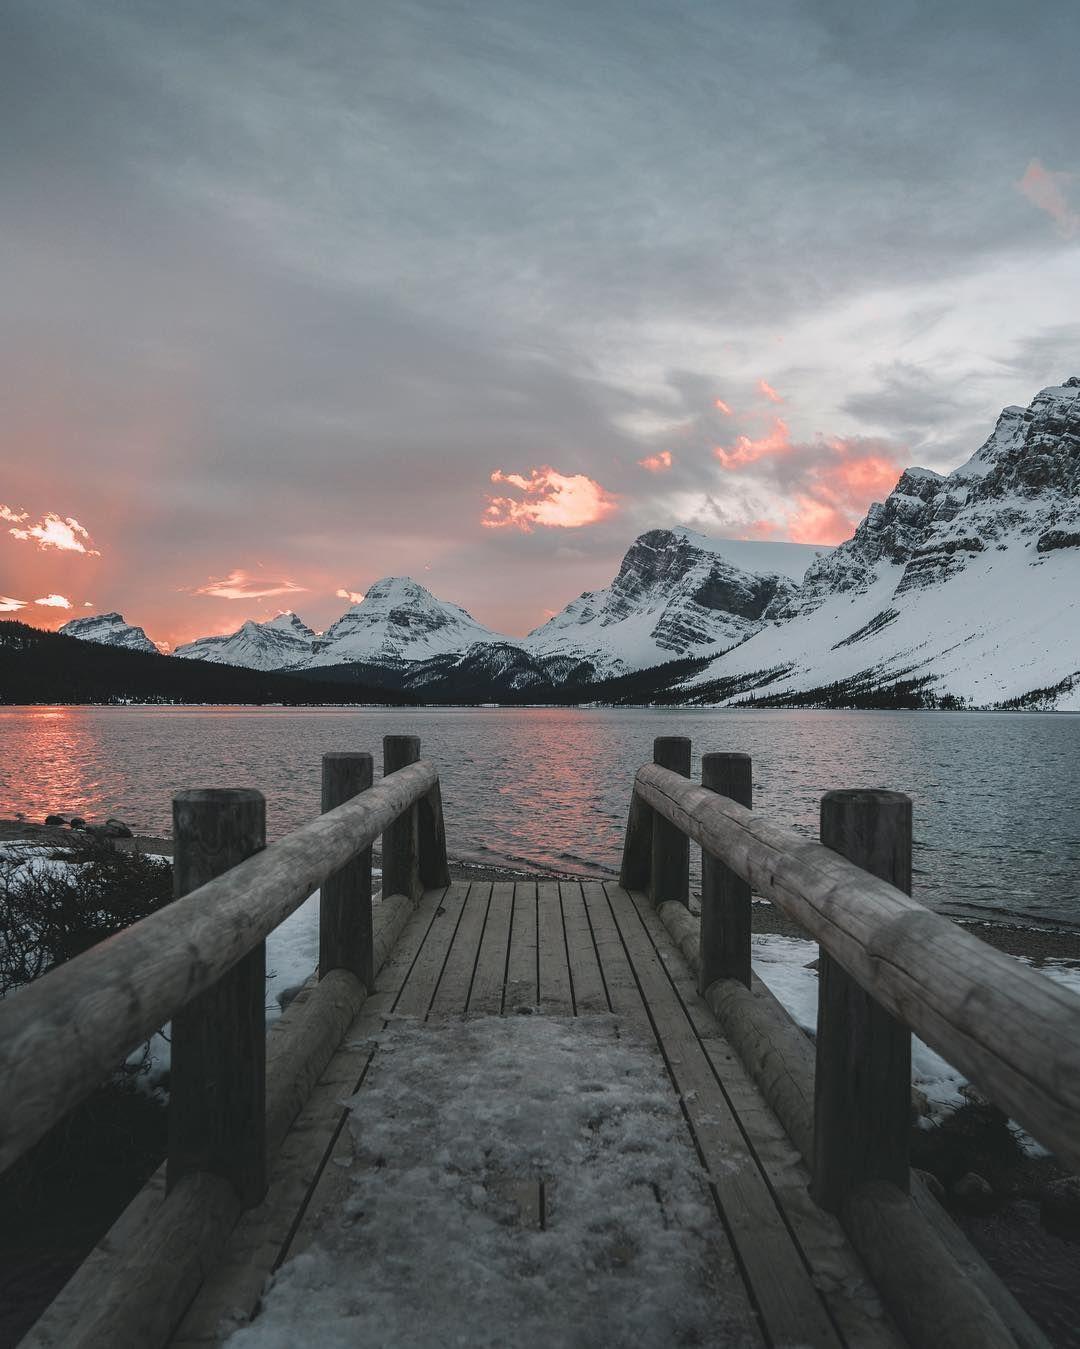 Travel Scenery: Gorgeous Landscape Photography By Davey Gravy